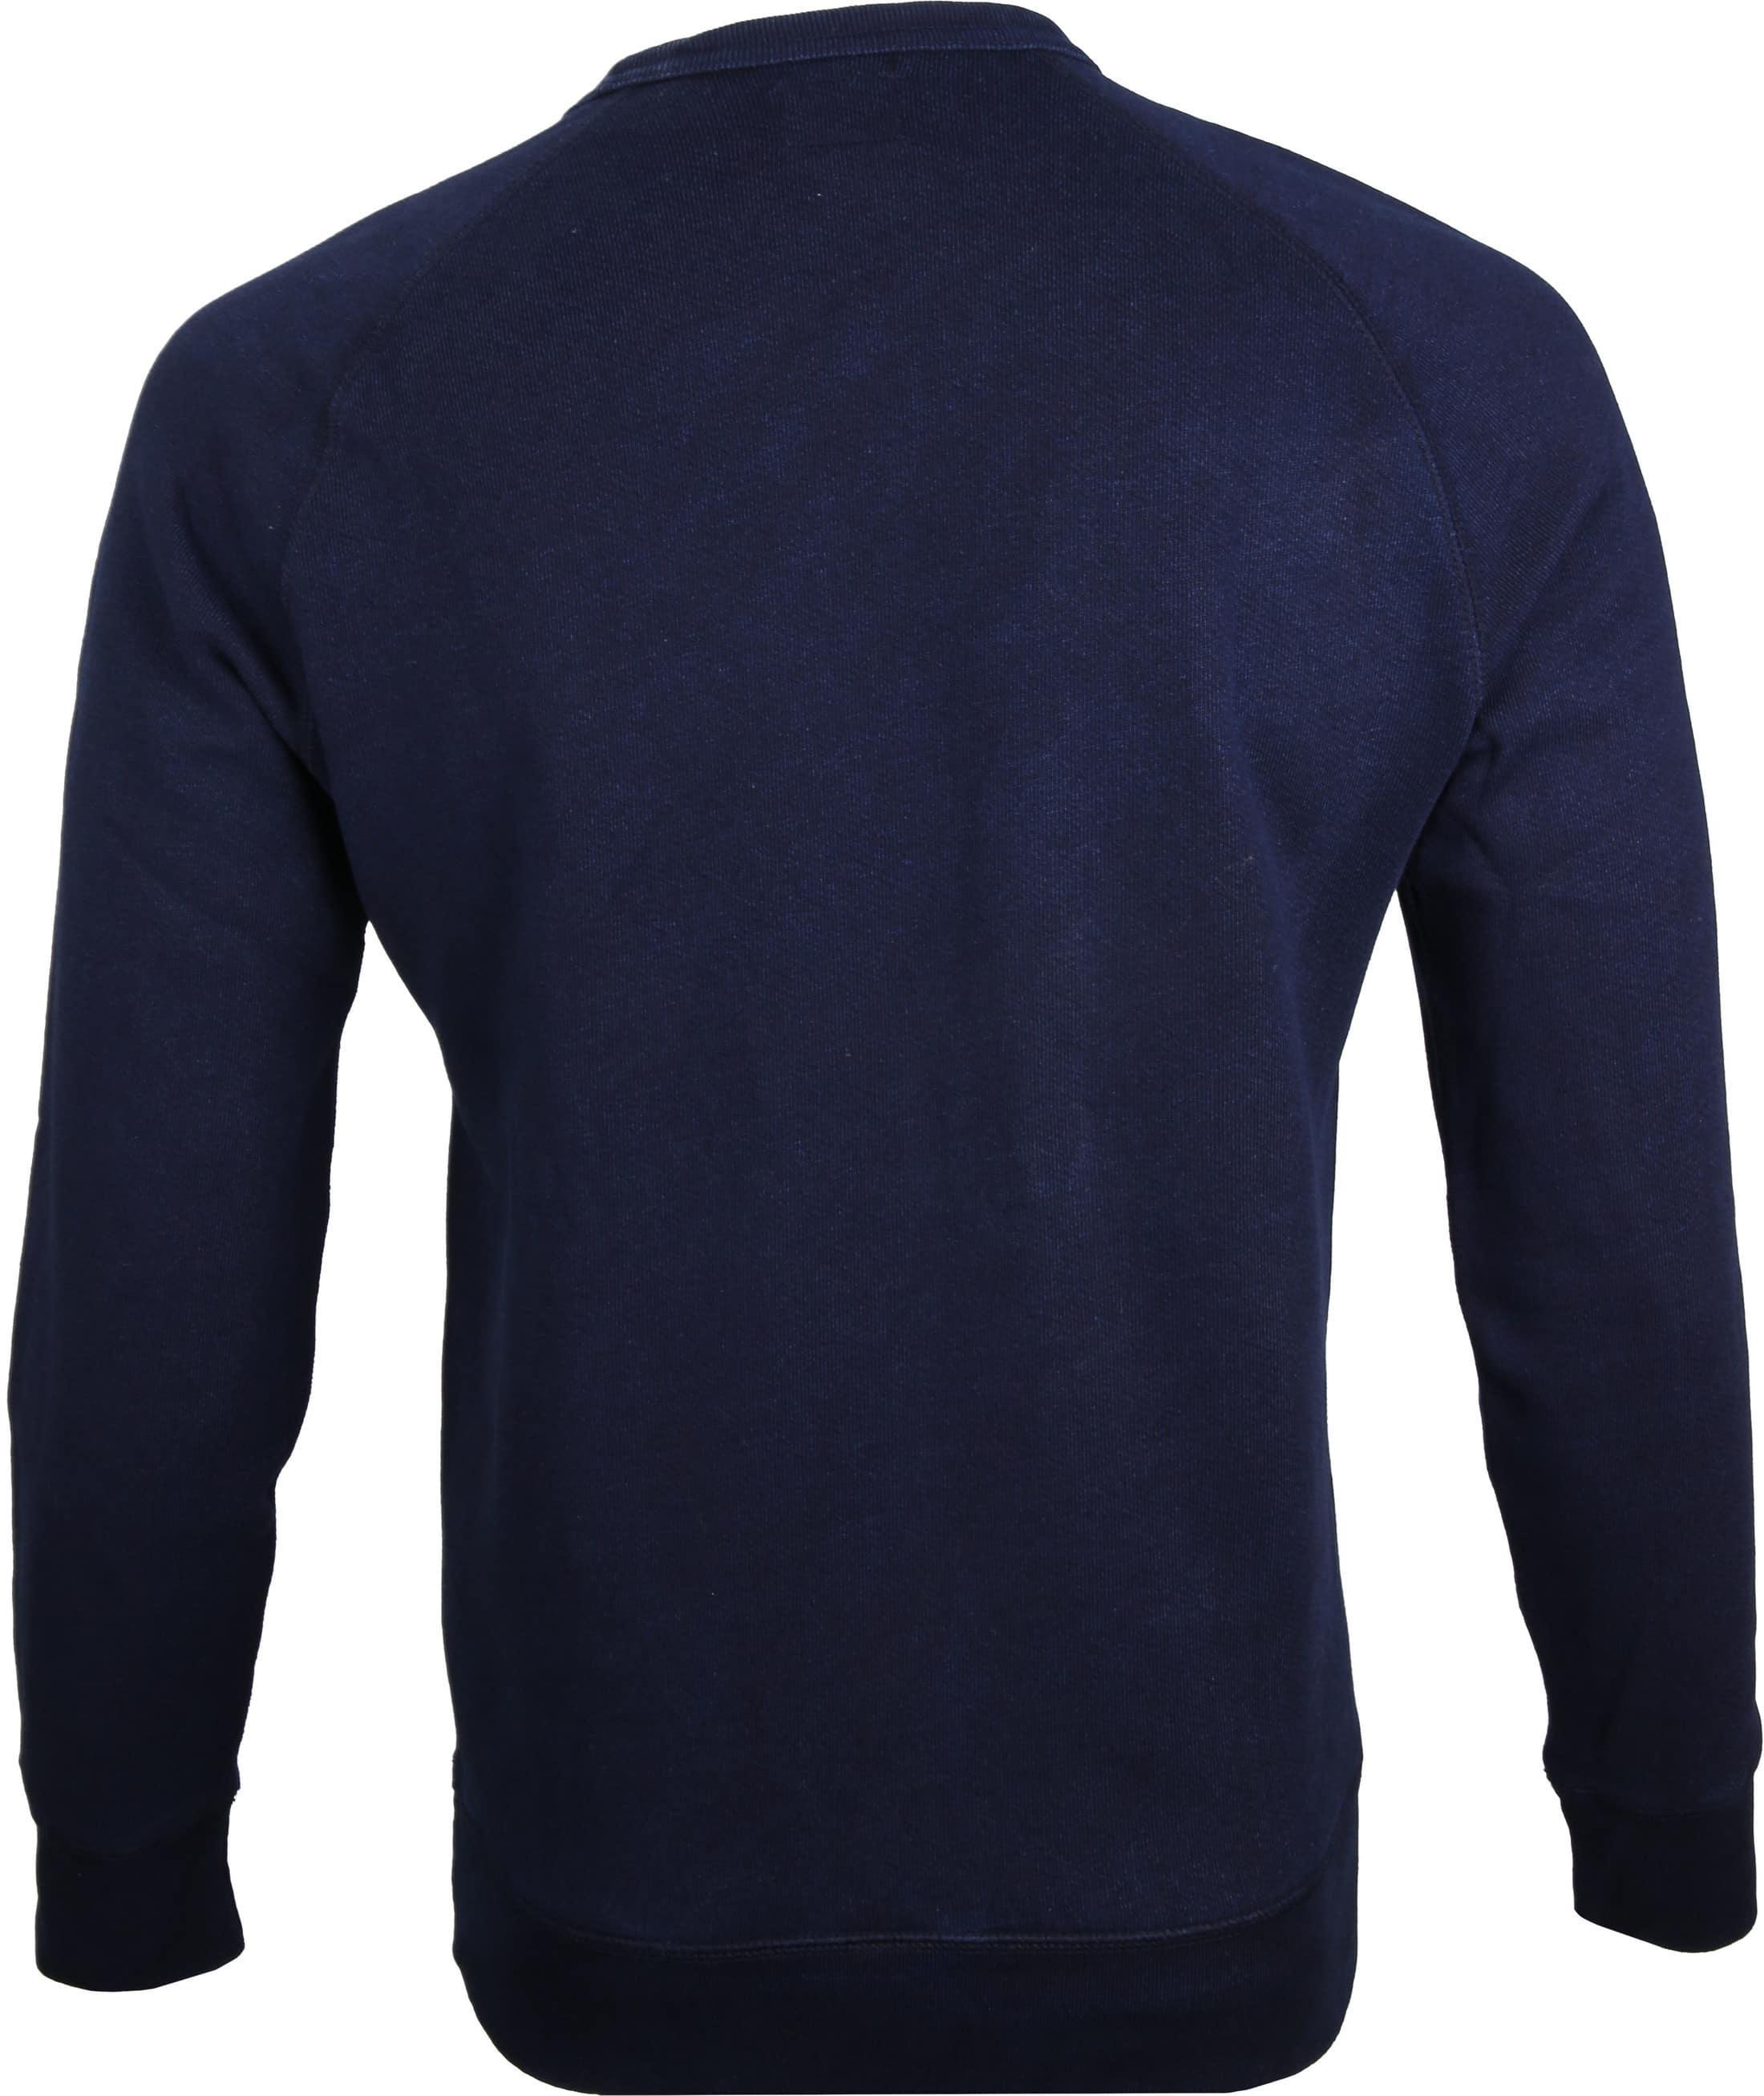 Levi's Original Sweater Navy foto 2